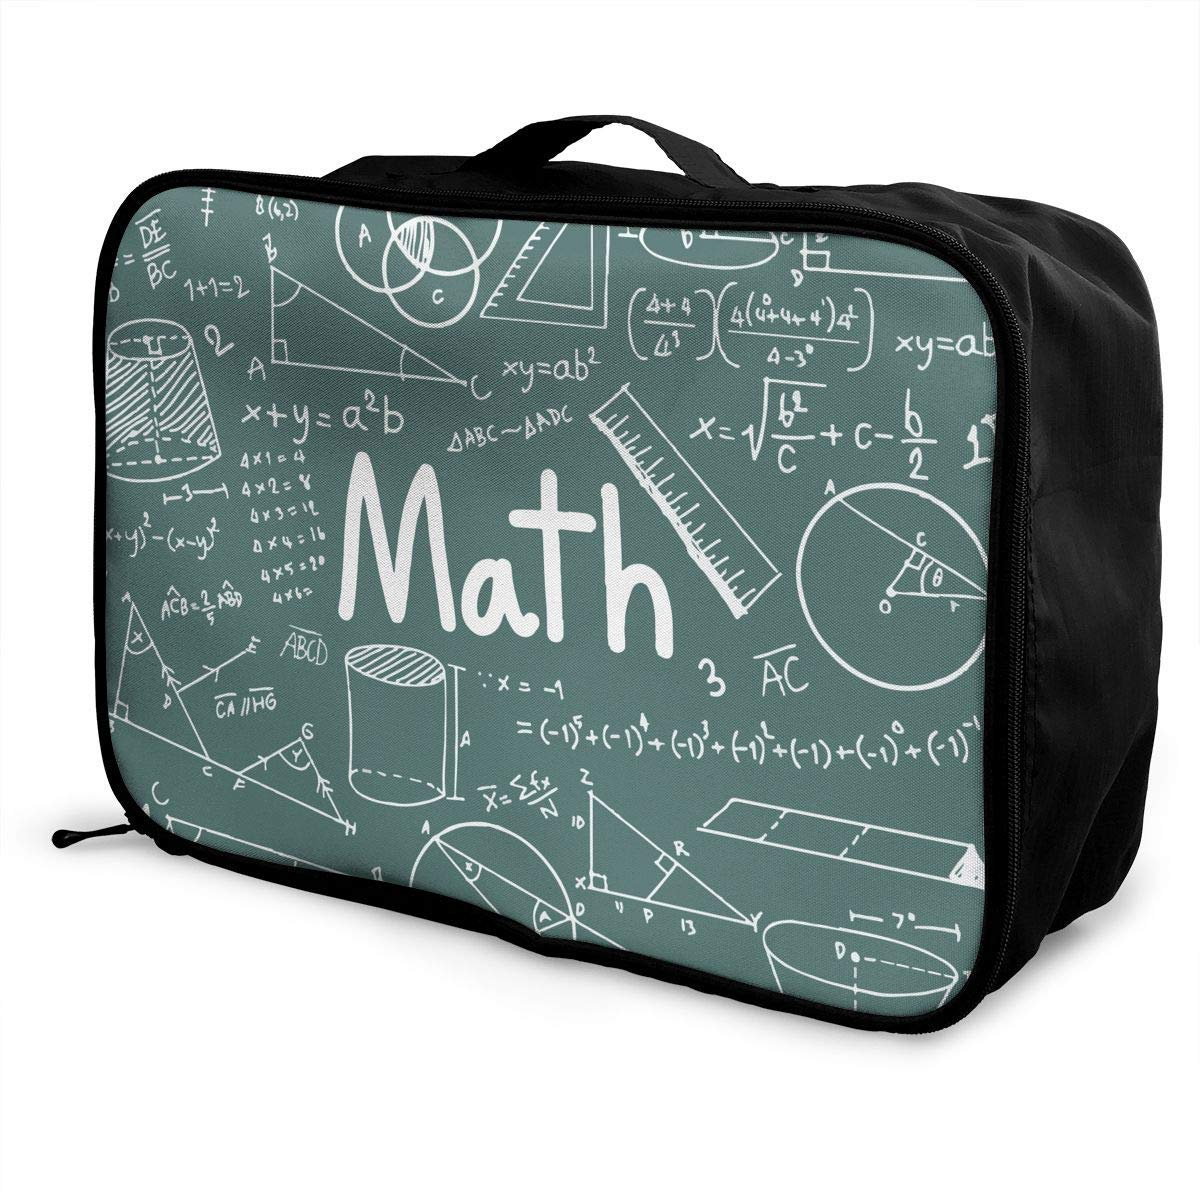 JTRVW Luggage Bags for Travel Math Mathematical Formula Equation Travel Duffel Bag Waterproof Fashion Lightweight Large Capacity Portable Duffel Bag for Men /& Women